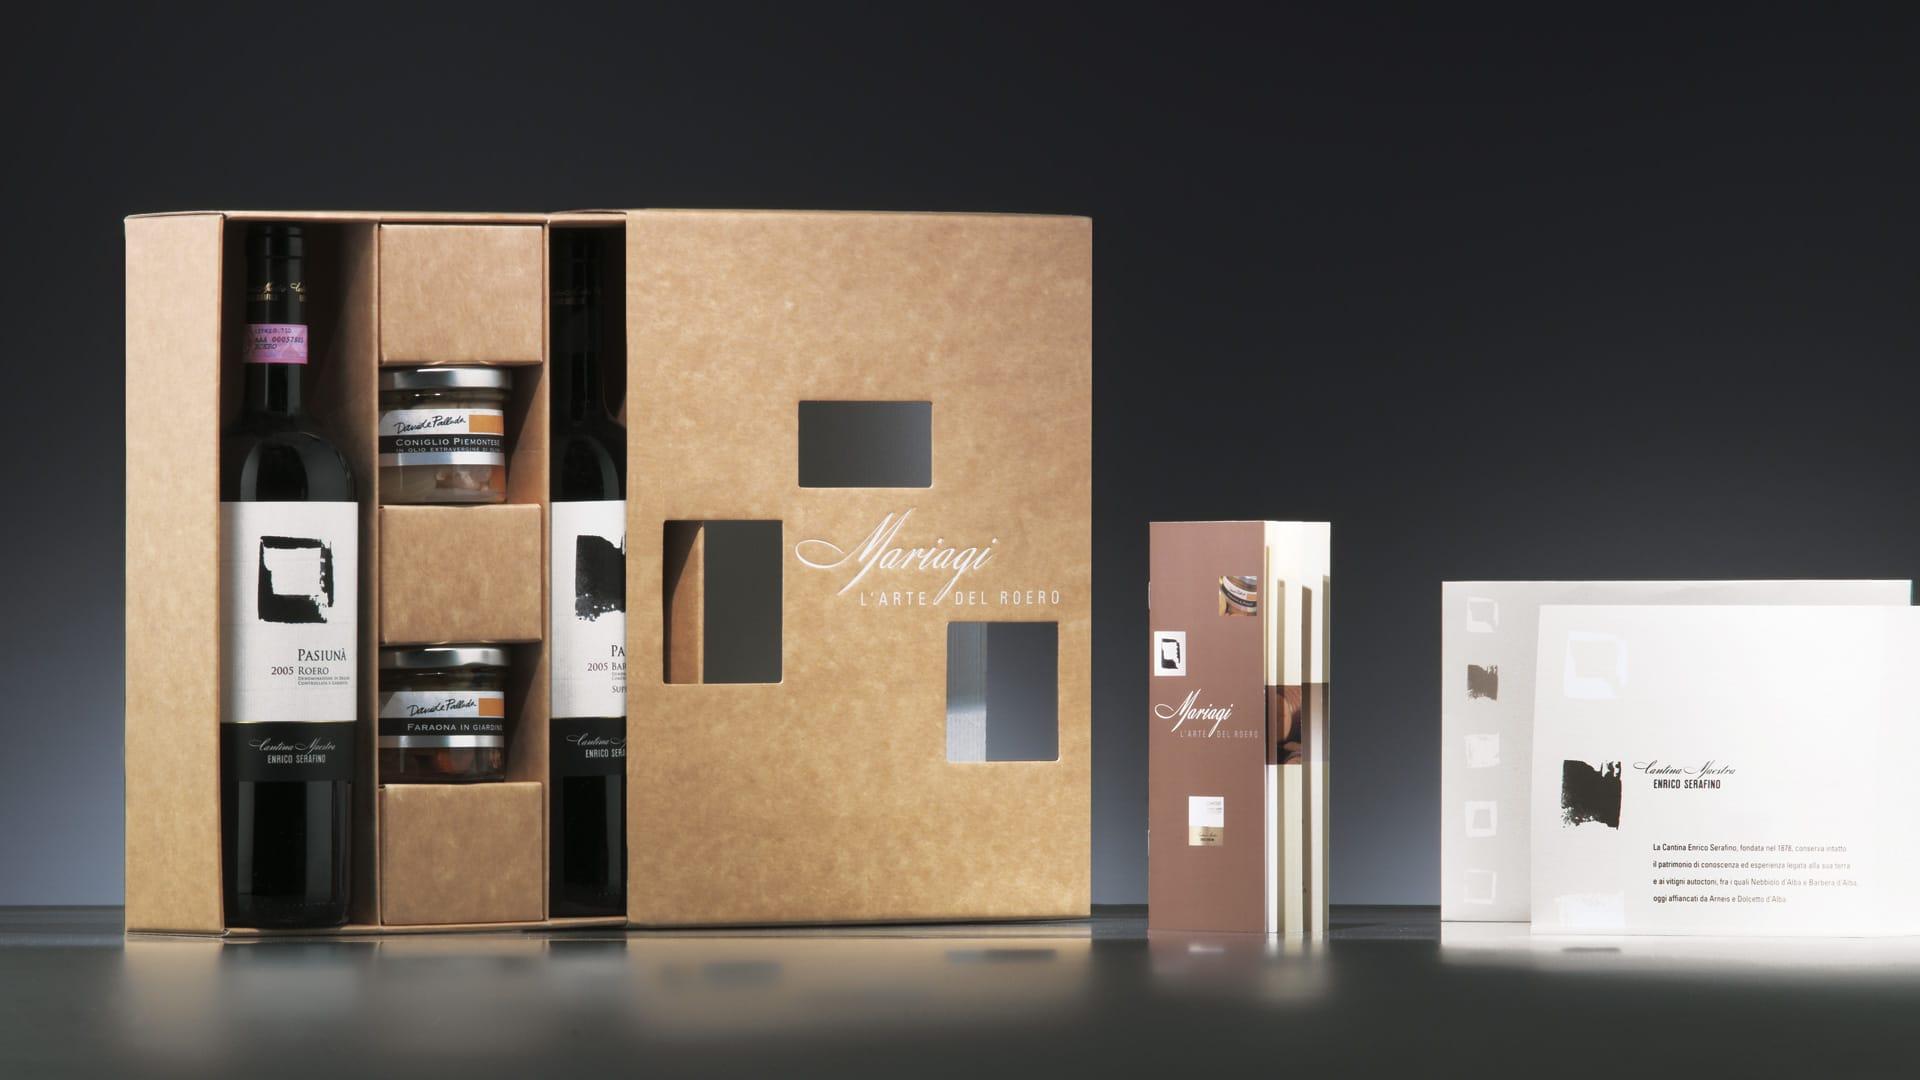 Enrico Serafino Mariagi global design